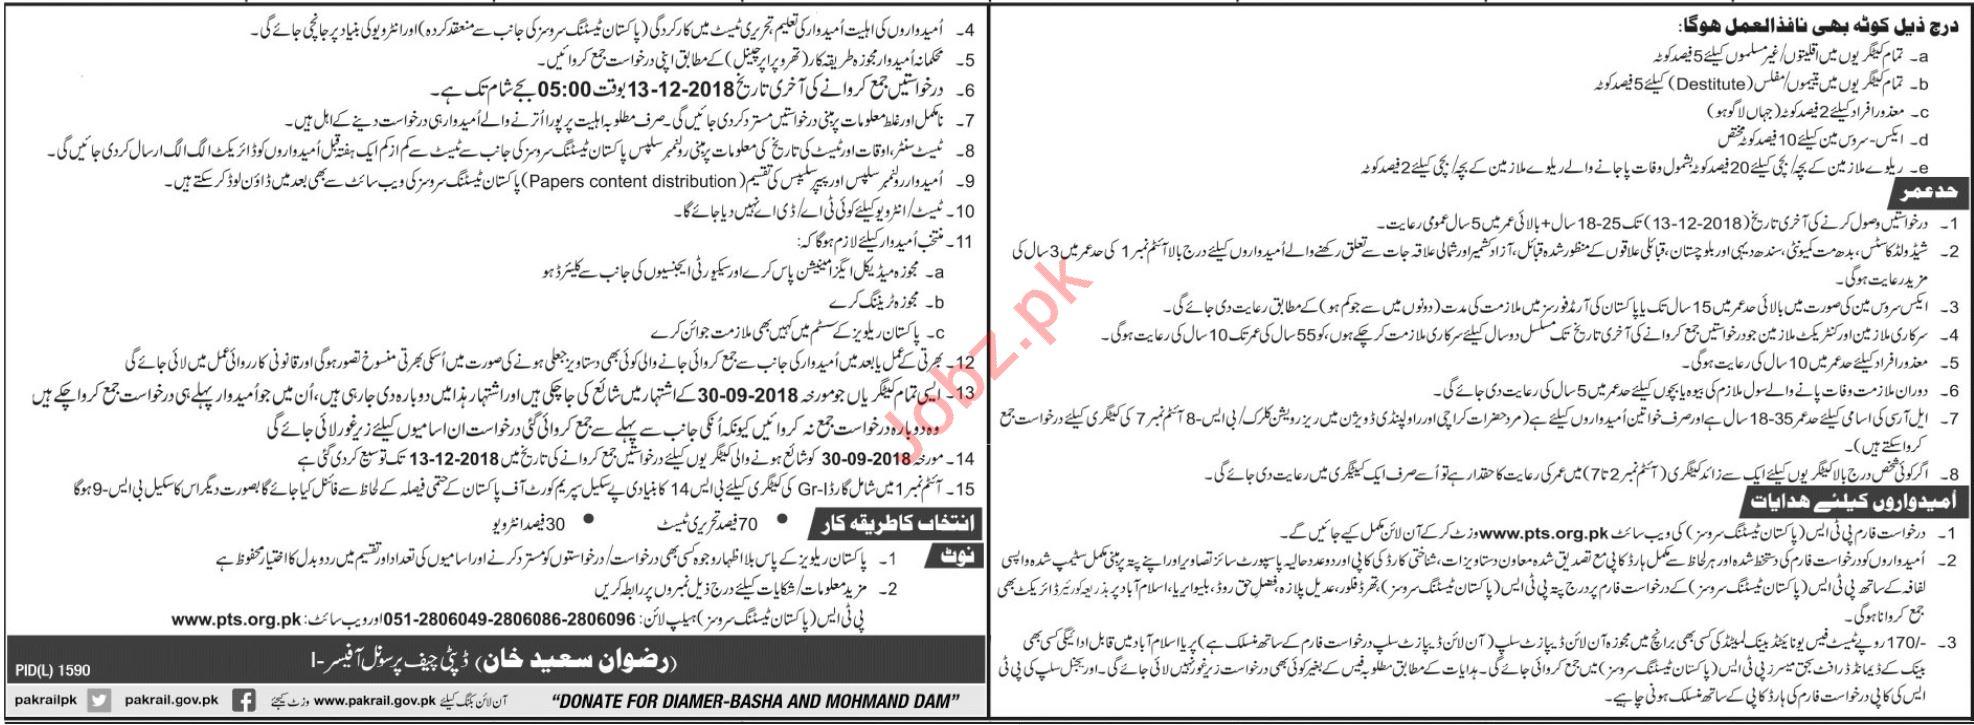 Pakistan Railways SM Group Student Career Opportunities